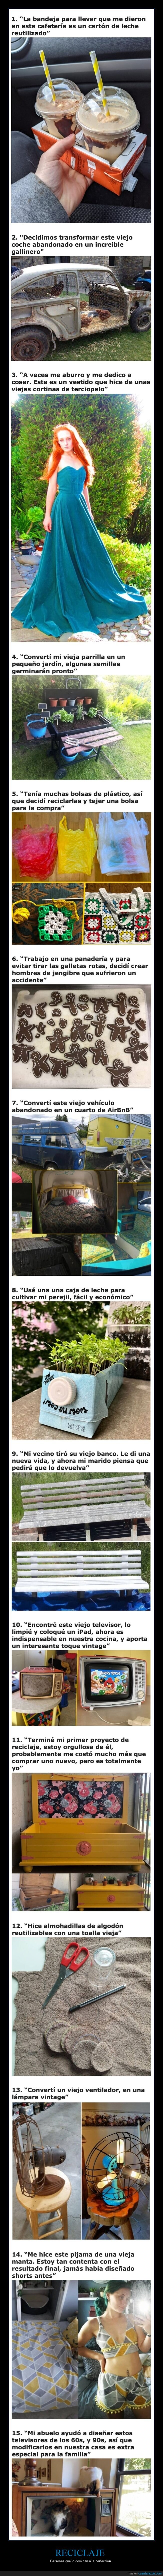 reciclaje,reutilizar